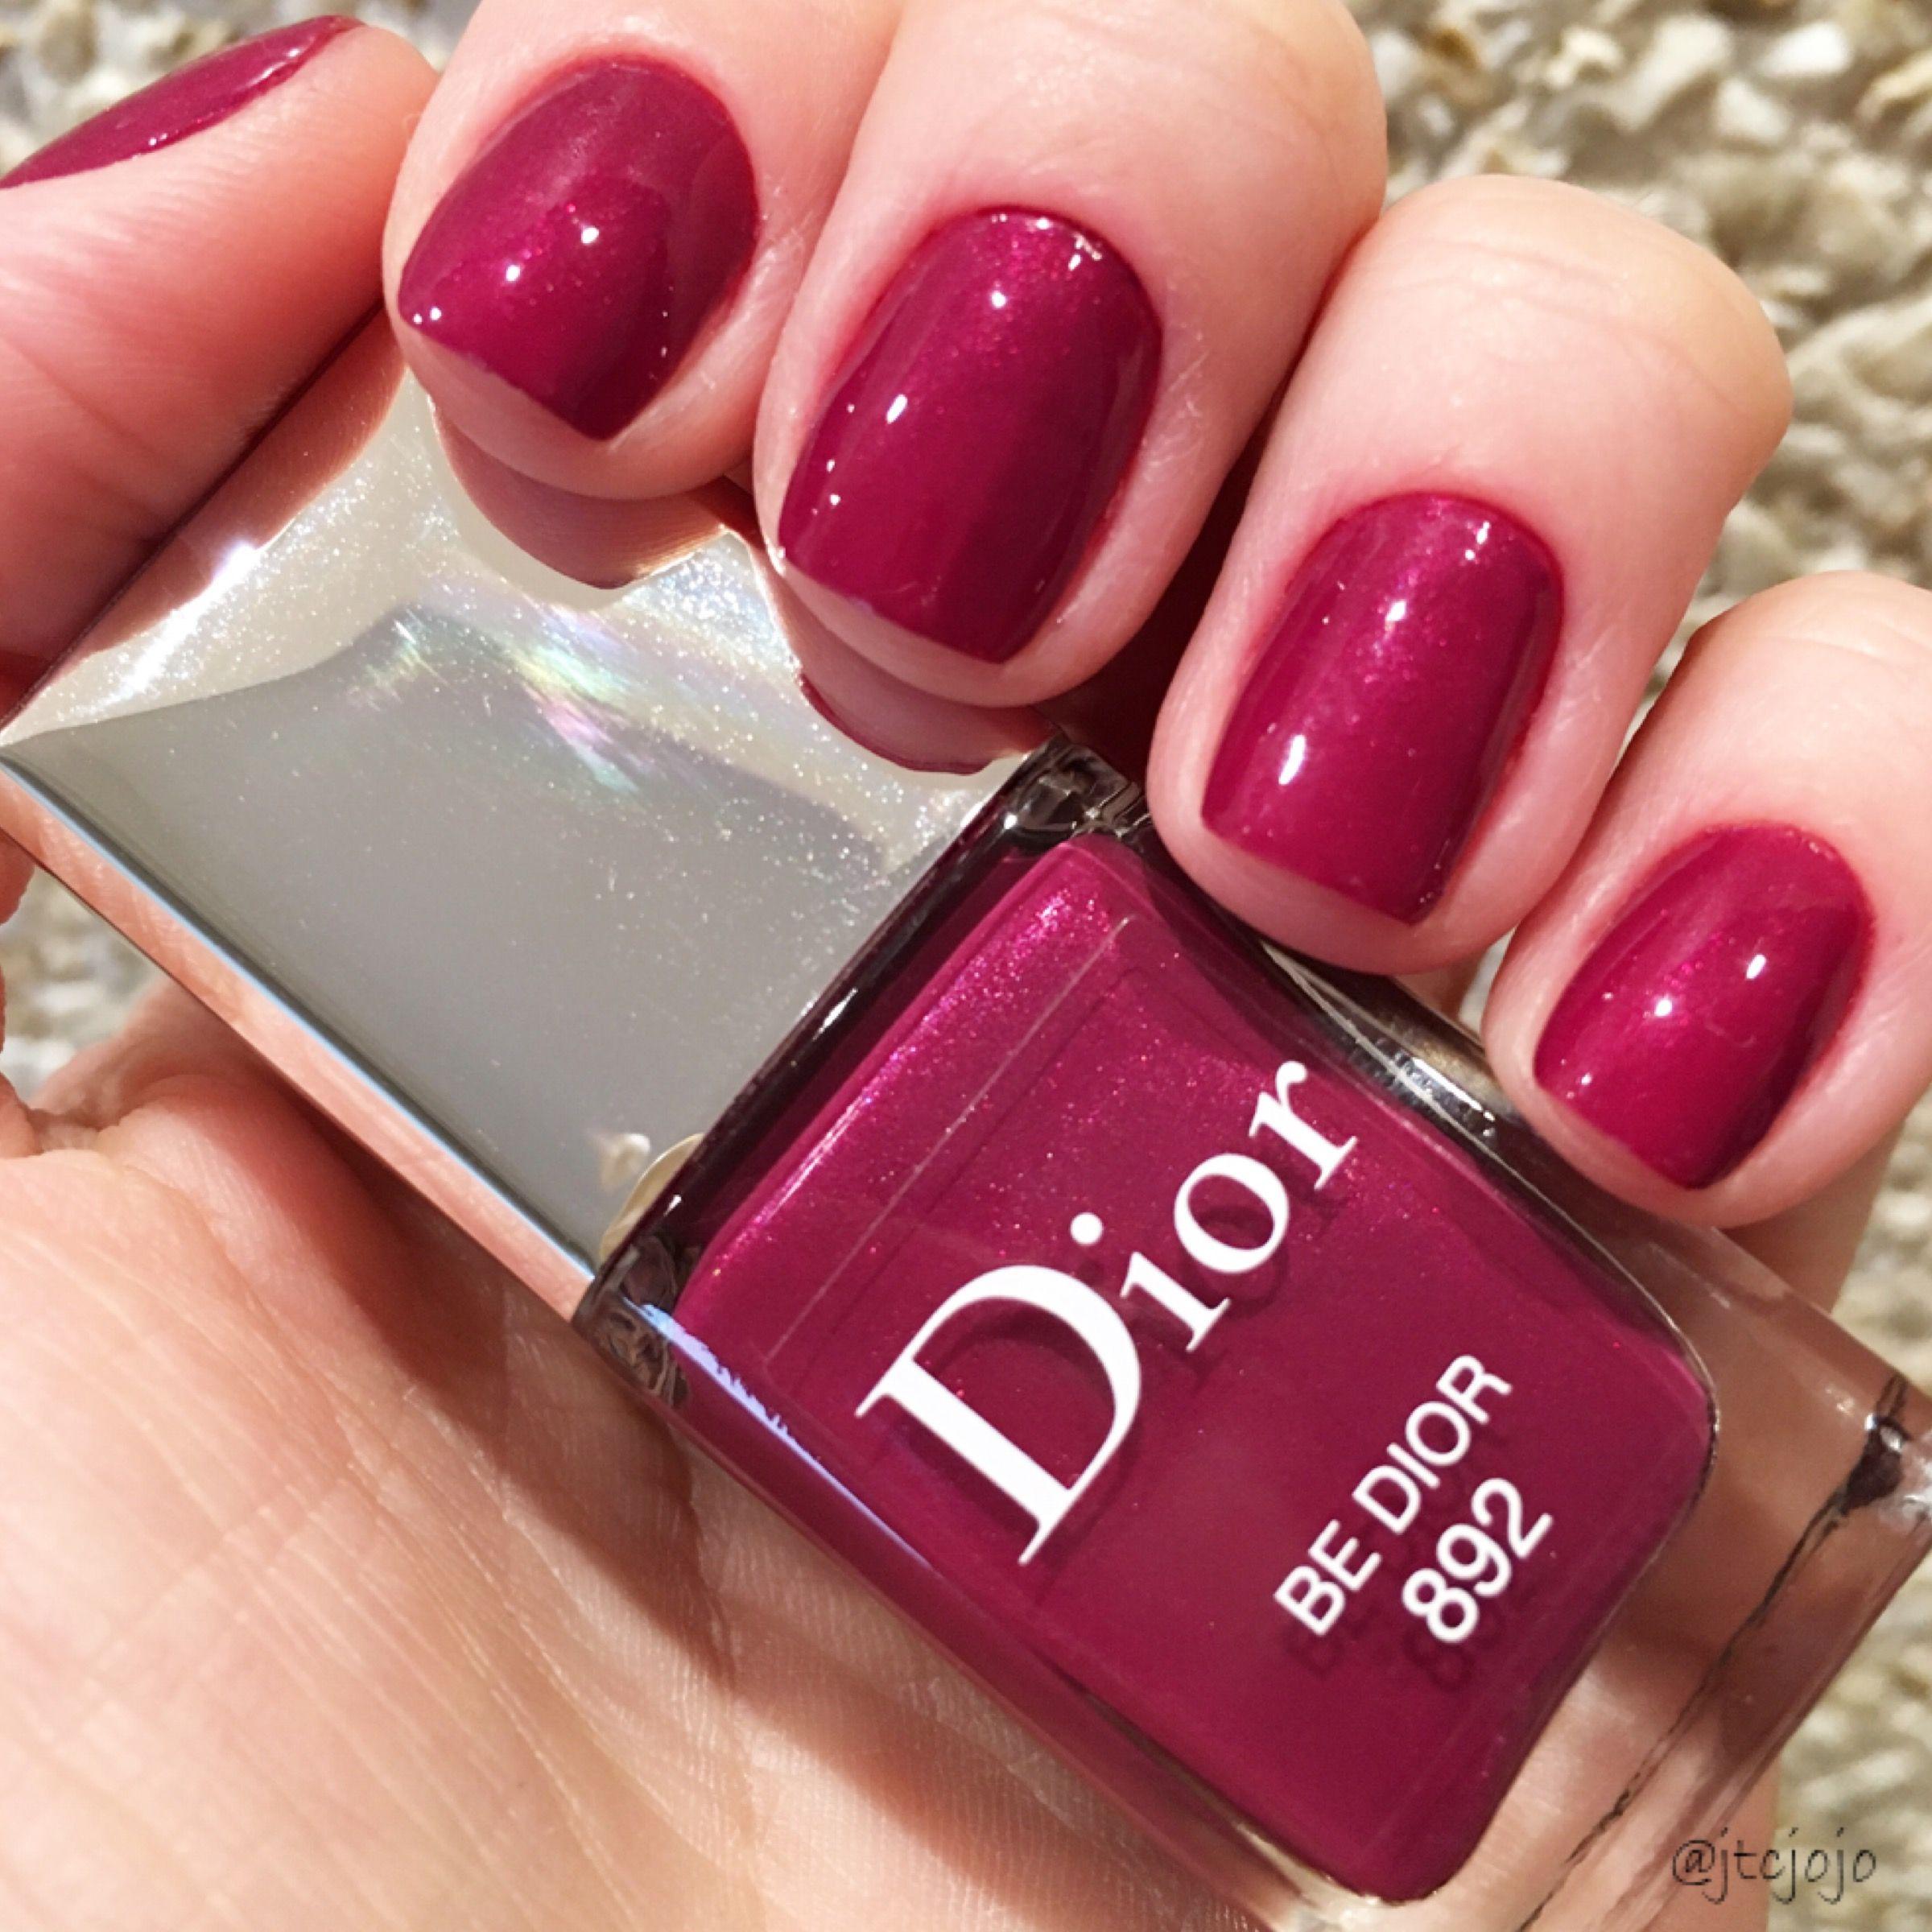 Be Dior (892) - Dior | ディオール マニキュア | Pinterest | Esmalte